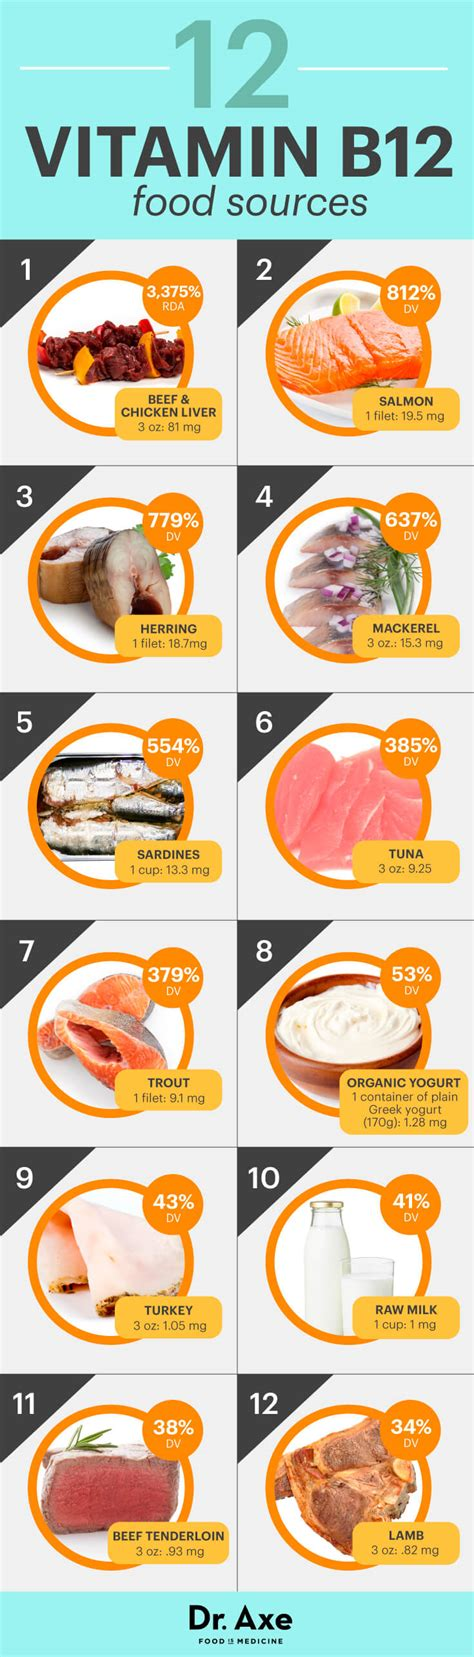 vitamina b12 alimenti vegani vitamin b12 benefits and deficiency symptoms dr axe